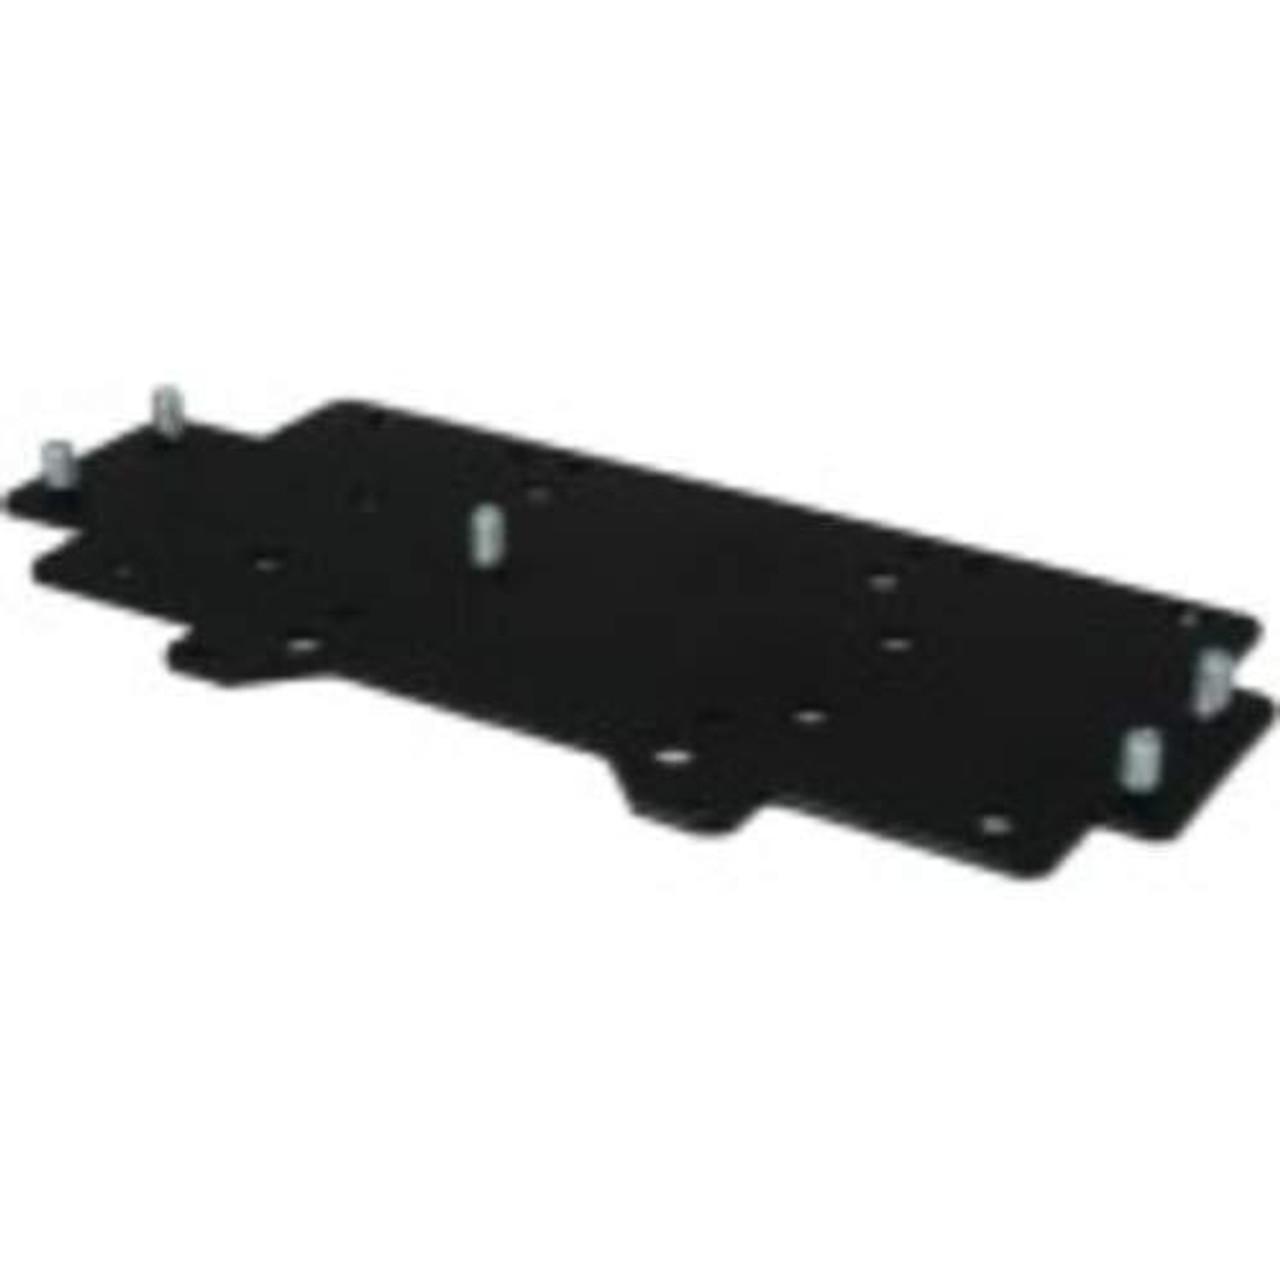 HAVIS, INC. Havis, Inc. C-Mm-201 Havis Monitor Adapter Plate Assembly